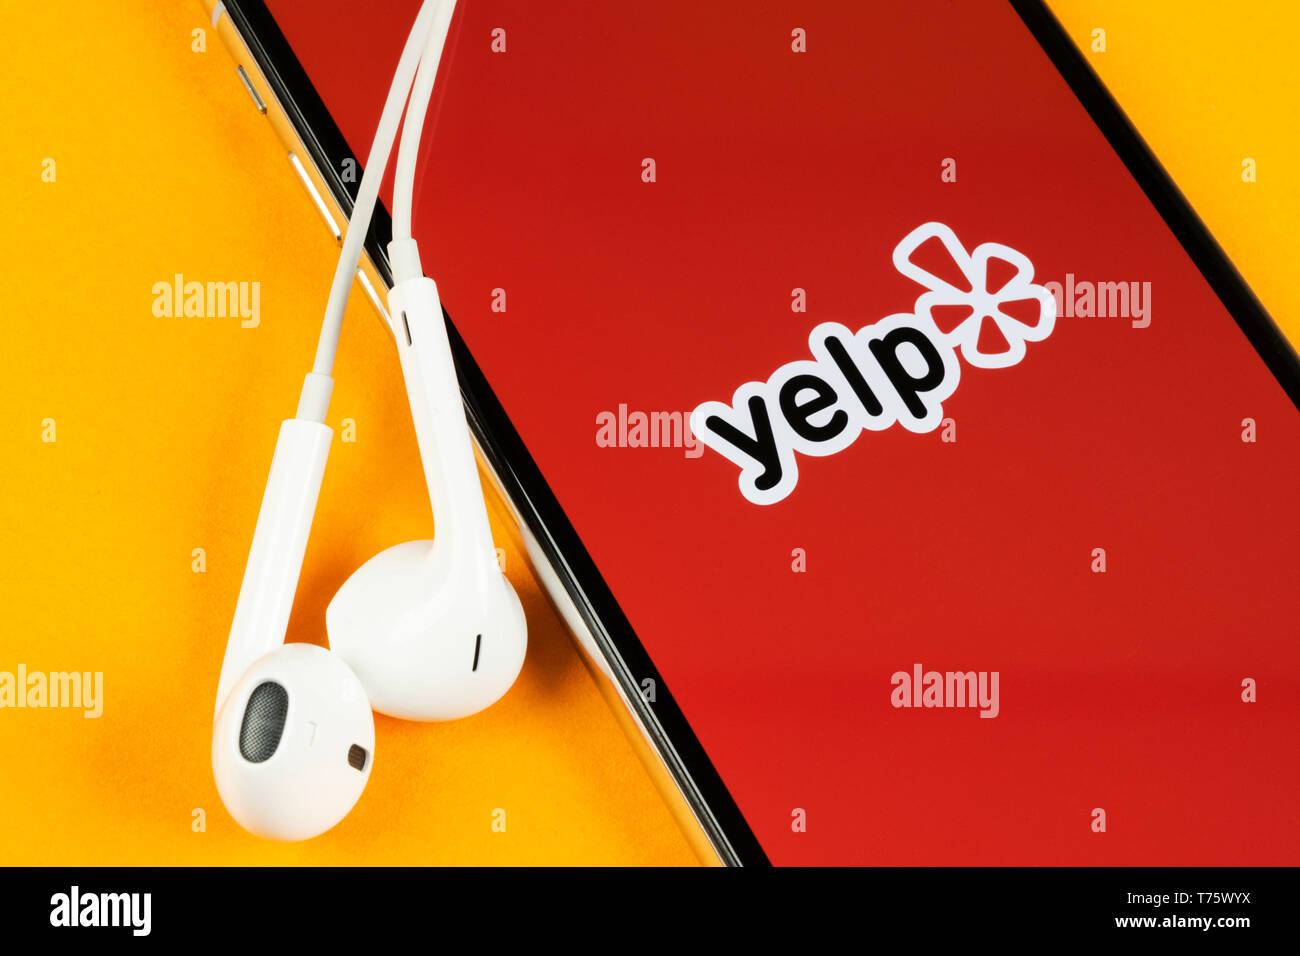 Yelp App Stock Photos & Yelp App Stock Images - Alamy